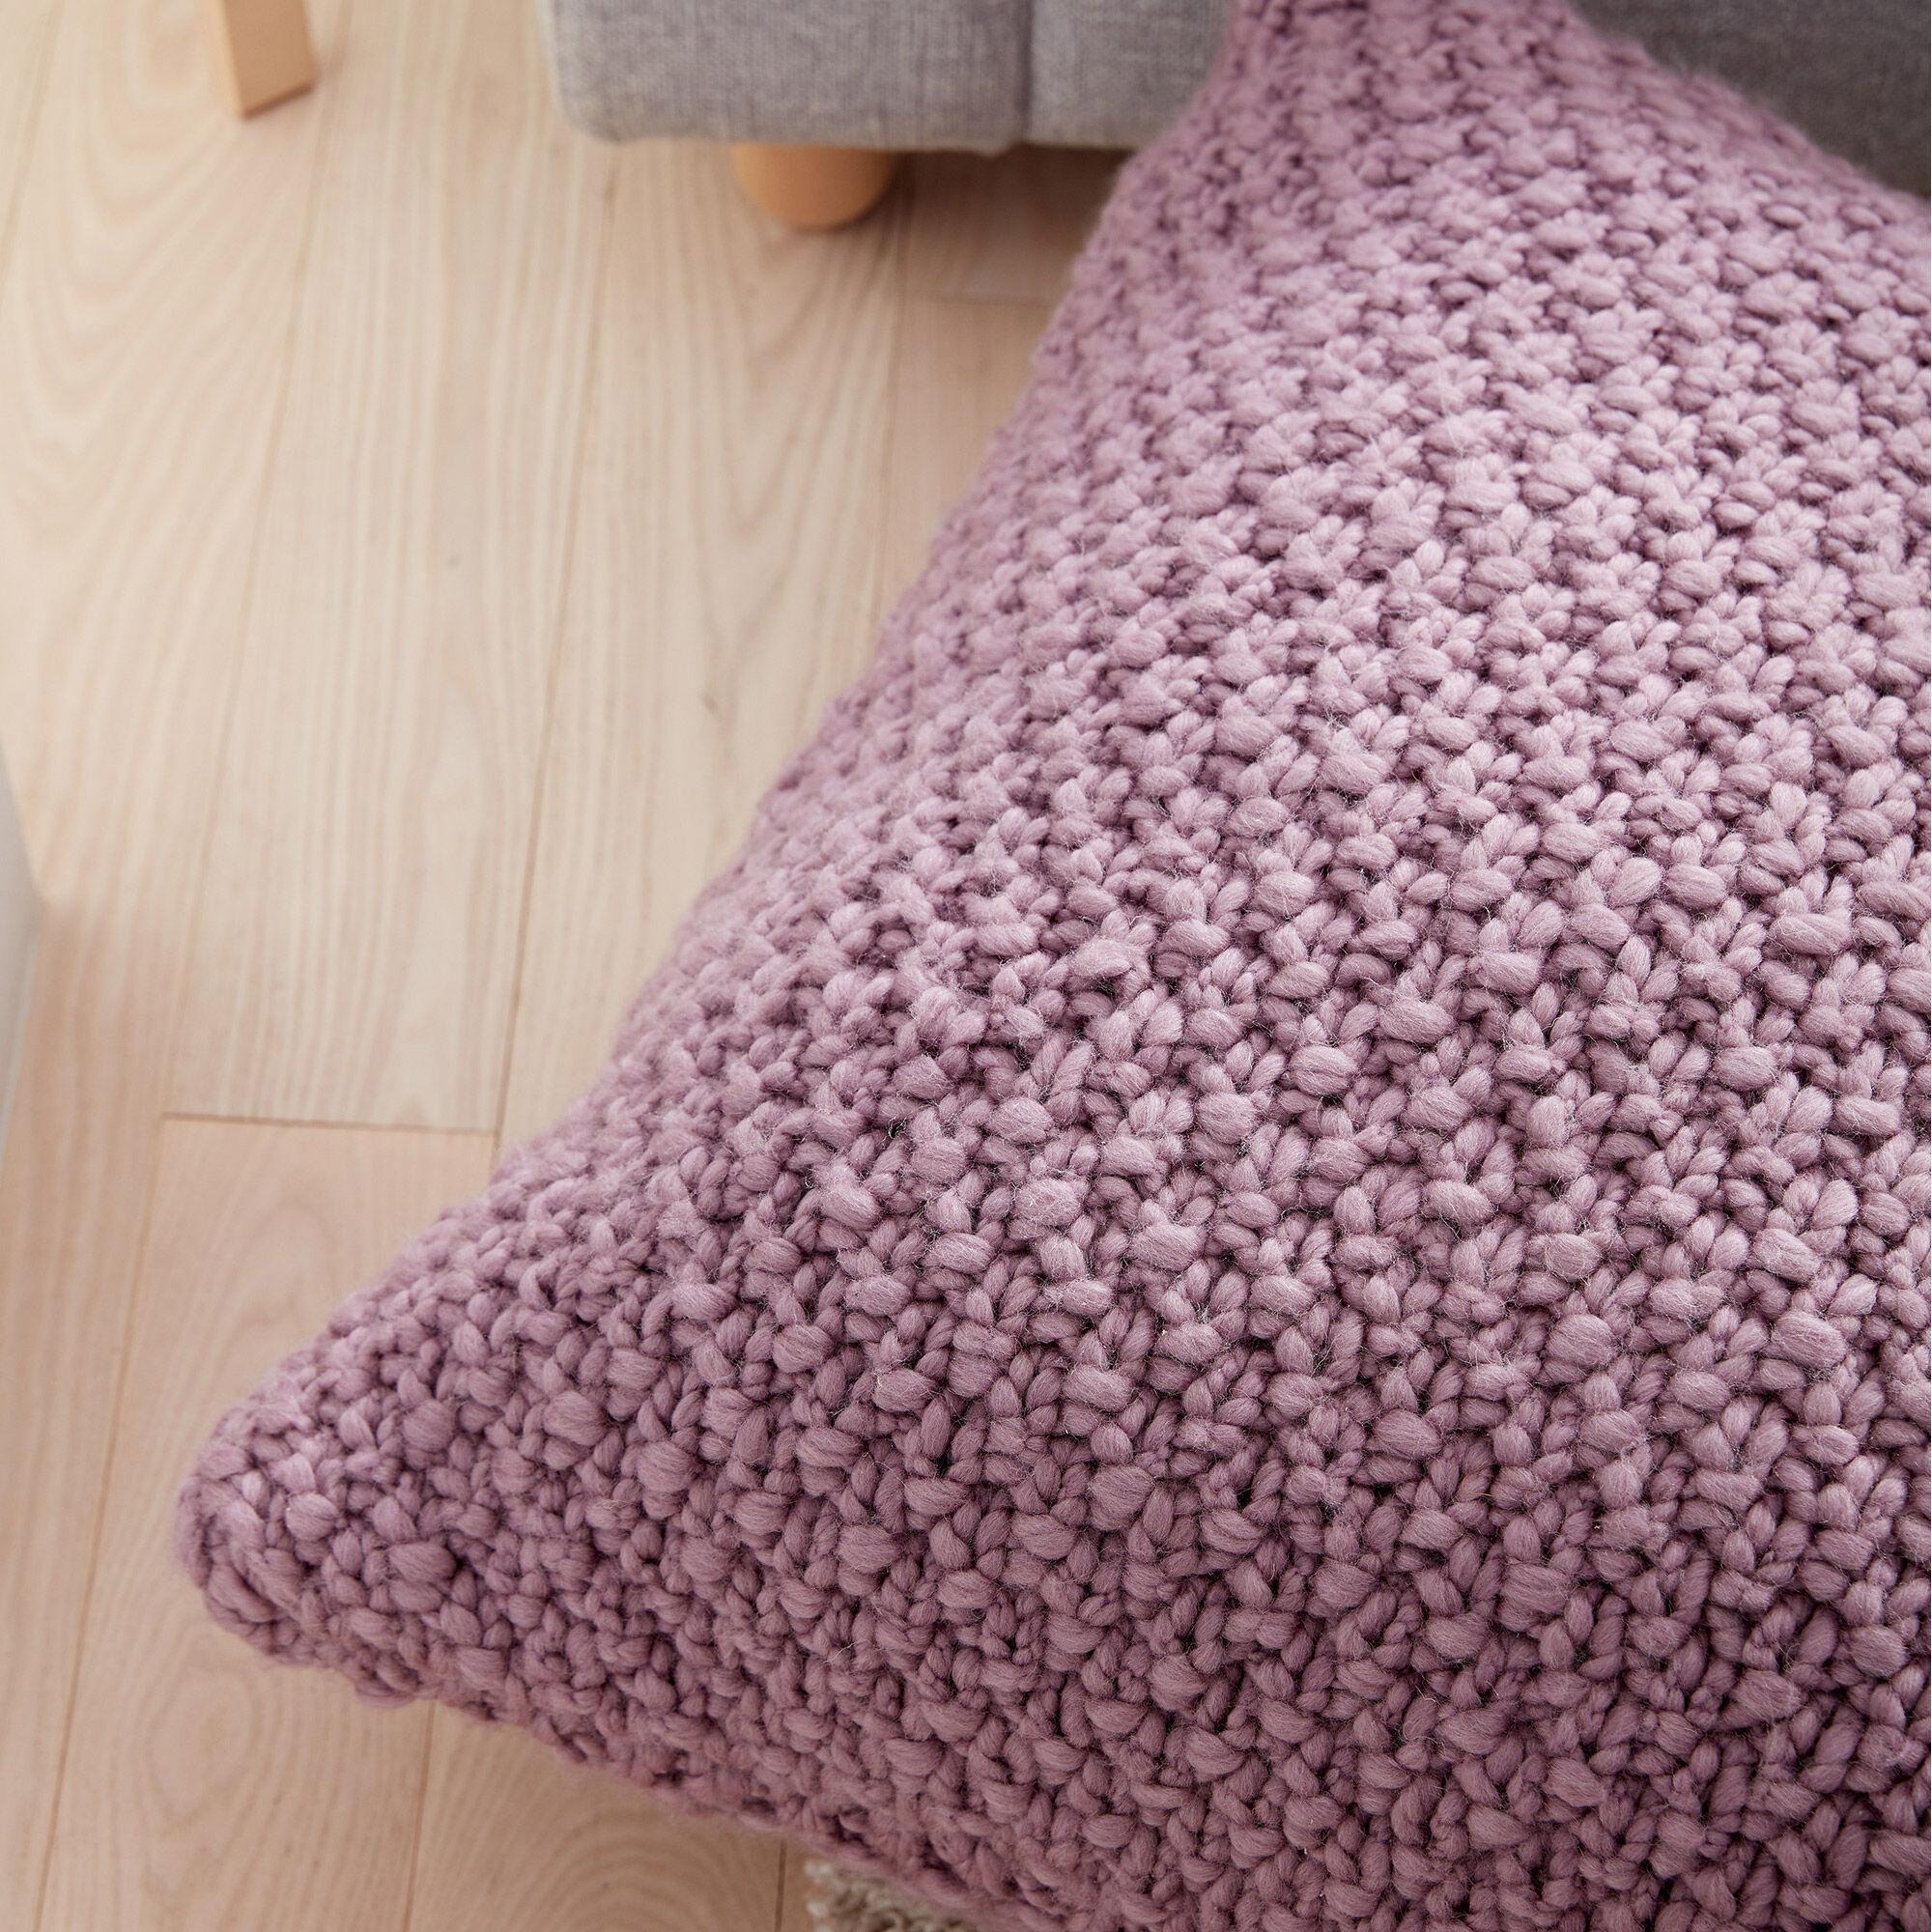 Knitting Websites Ireland : Patons irish moss knit floor pillow pattern yarnspirations